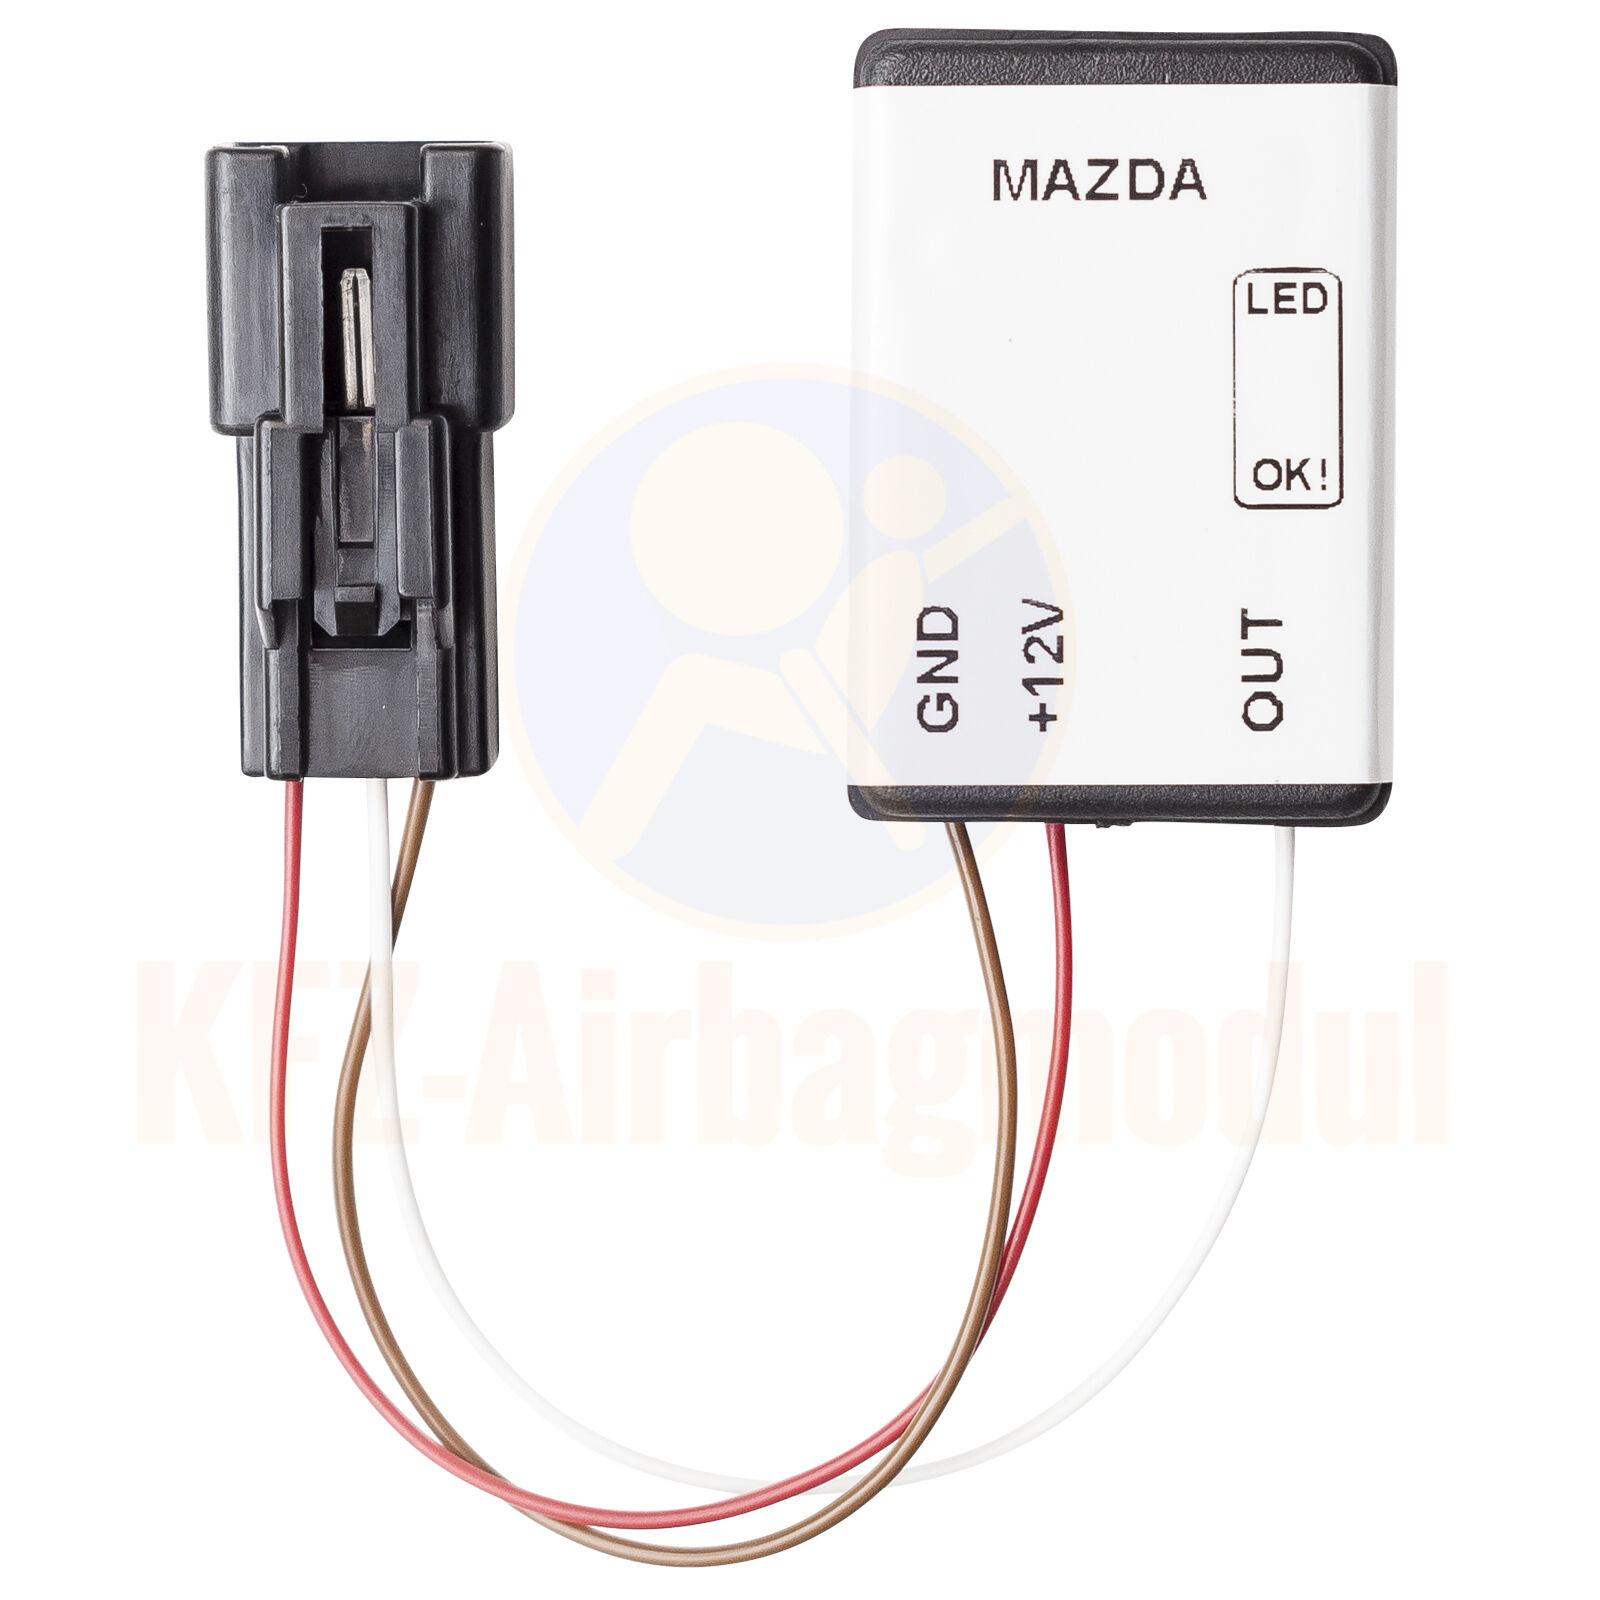 Mazda Seat Occupancy Detector Airbag Sensor Mats Leviton Phone Jack Wiring Diagram Http Wwwebaycom Itm Beifahrersitzerkennung Sbe Srs